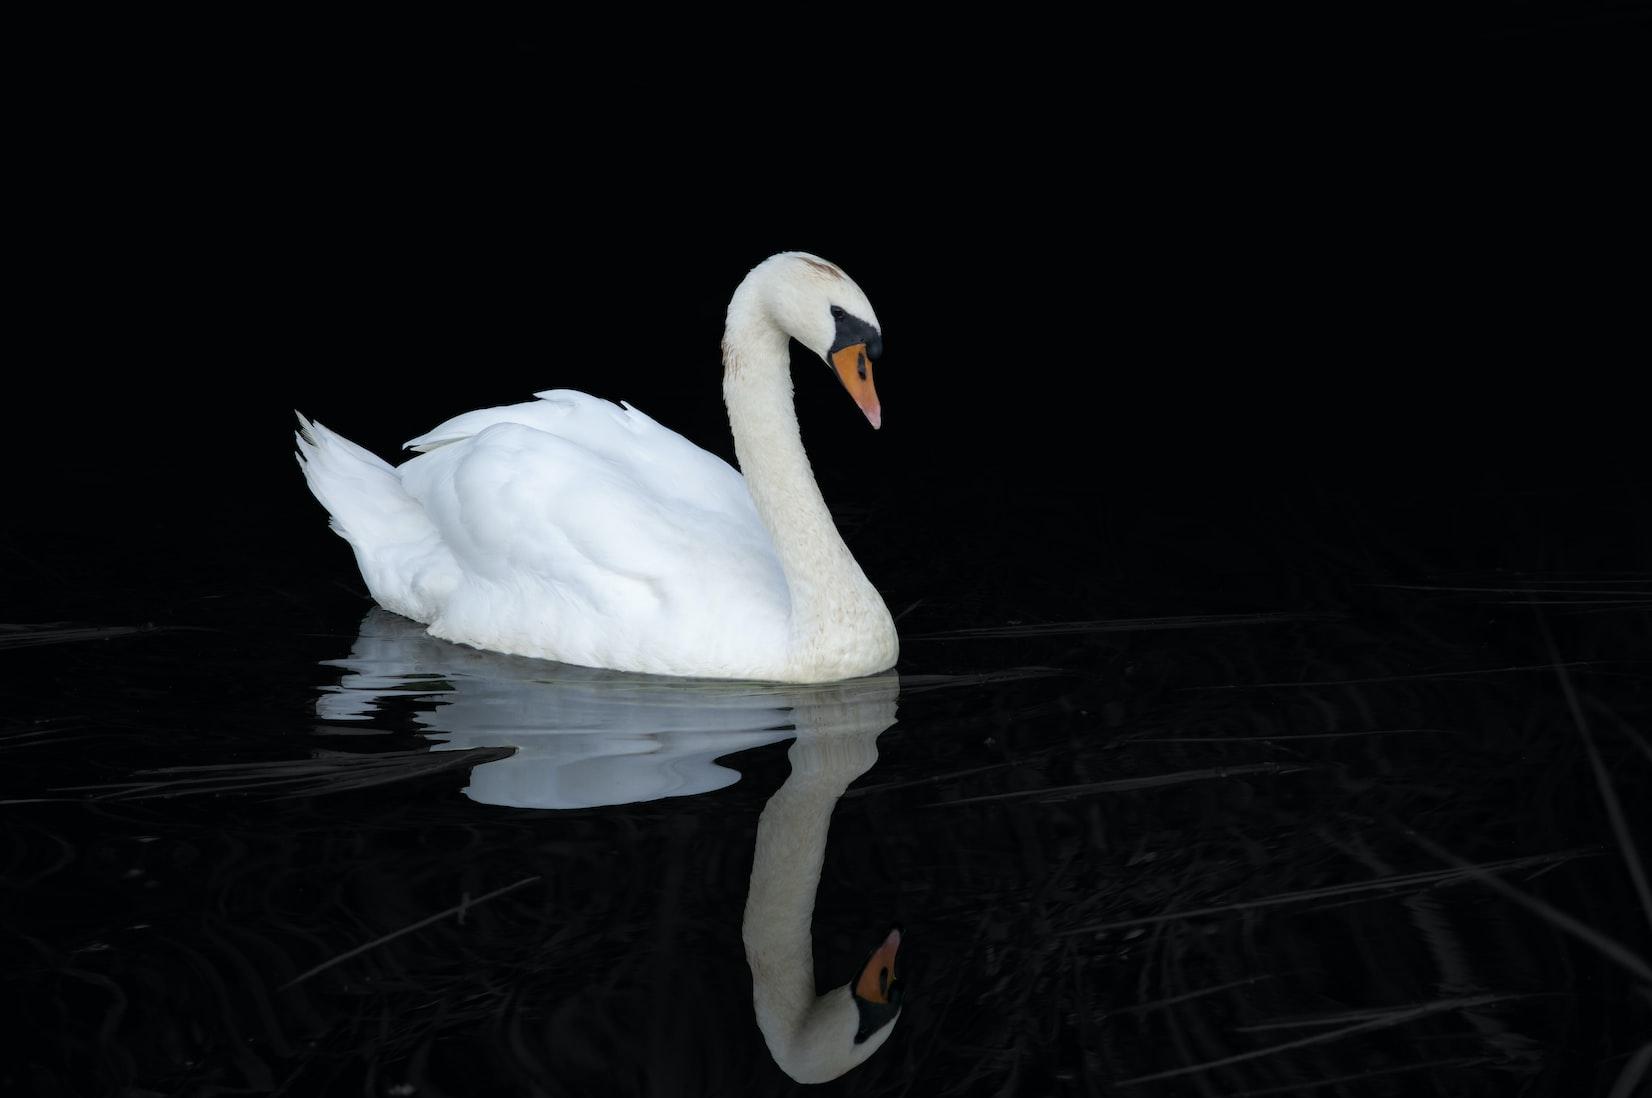 Swan Song: New York's Wildlife Bureaucrats Intend to Eradicate Wild Swans